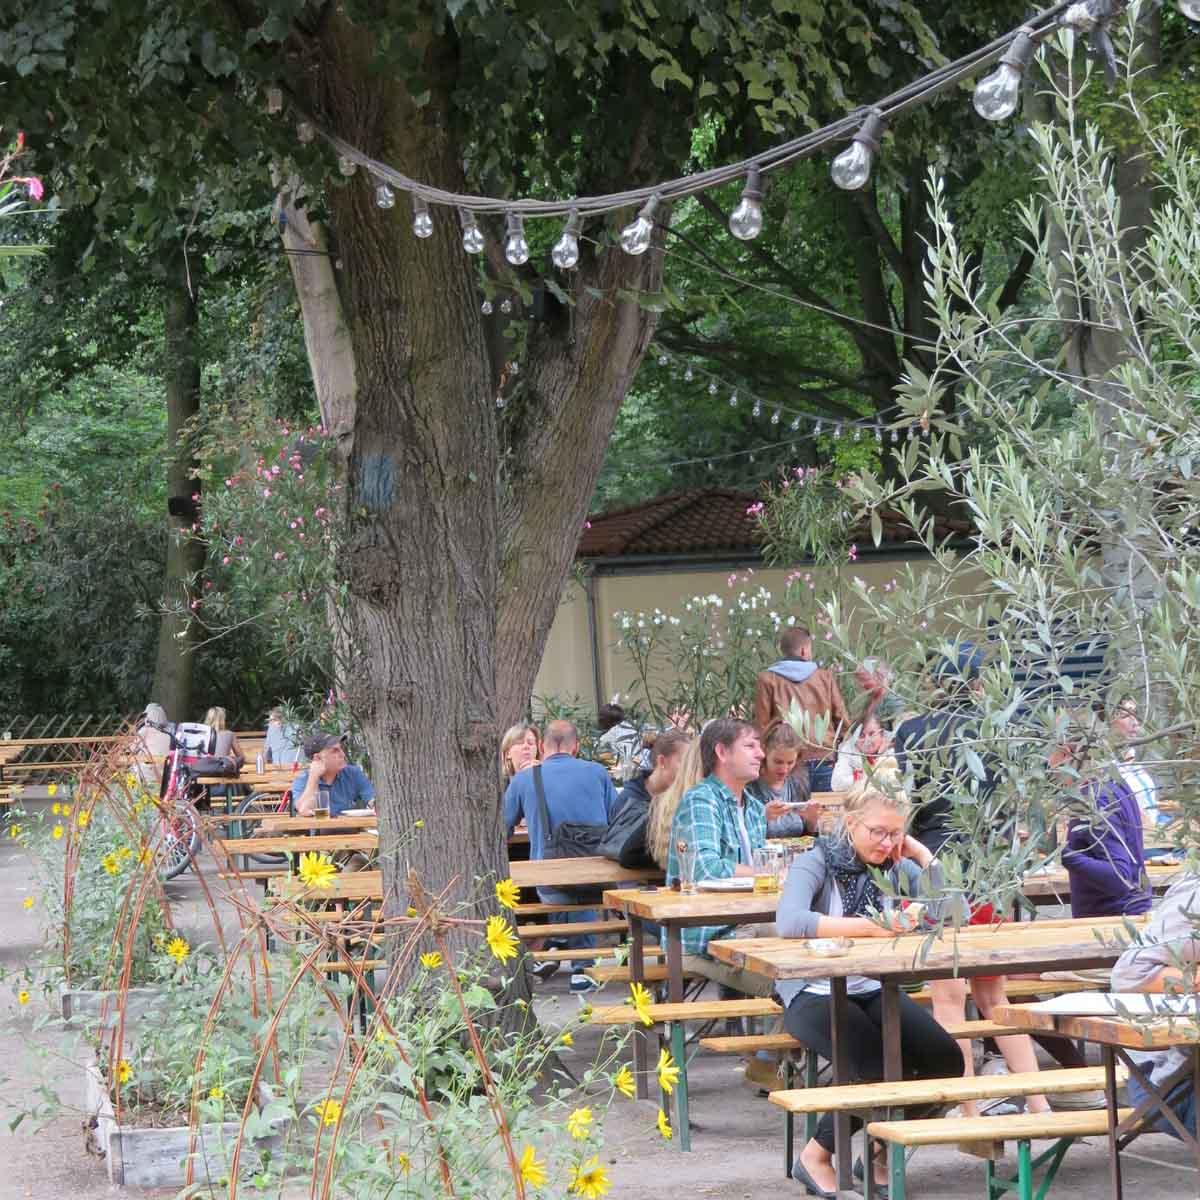 Cafe am neuen See, Berlijn in de zomer